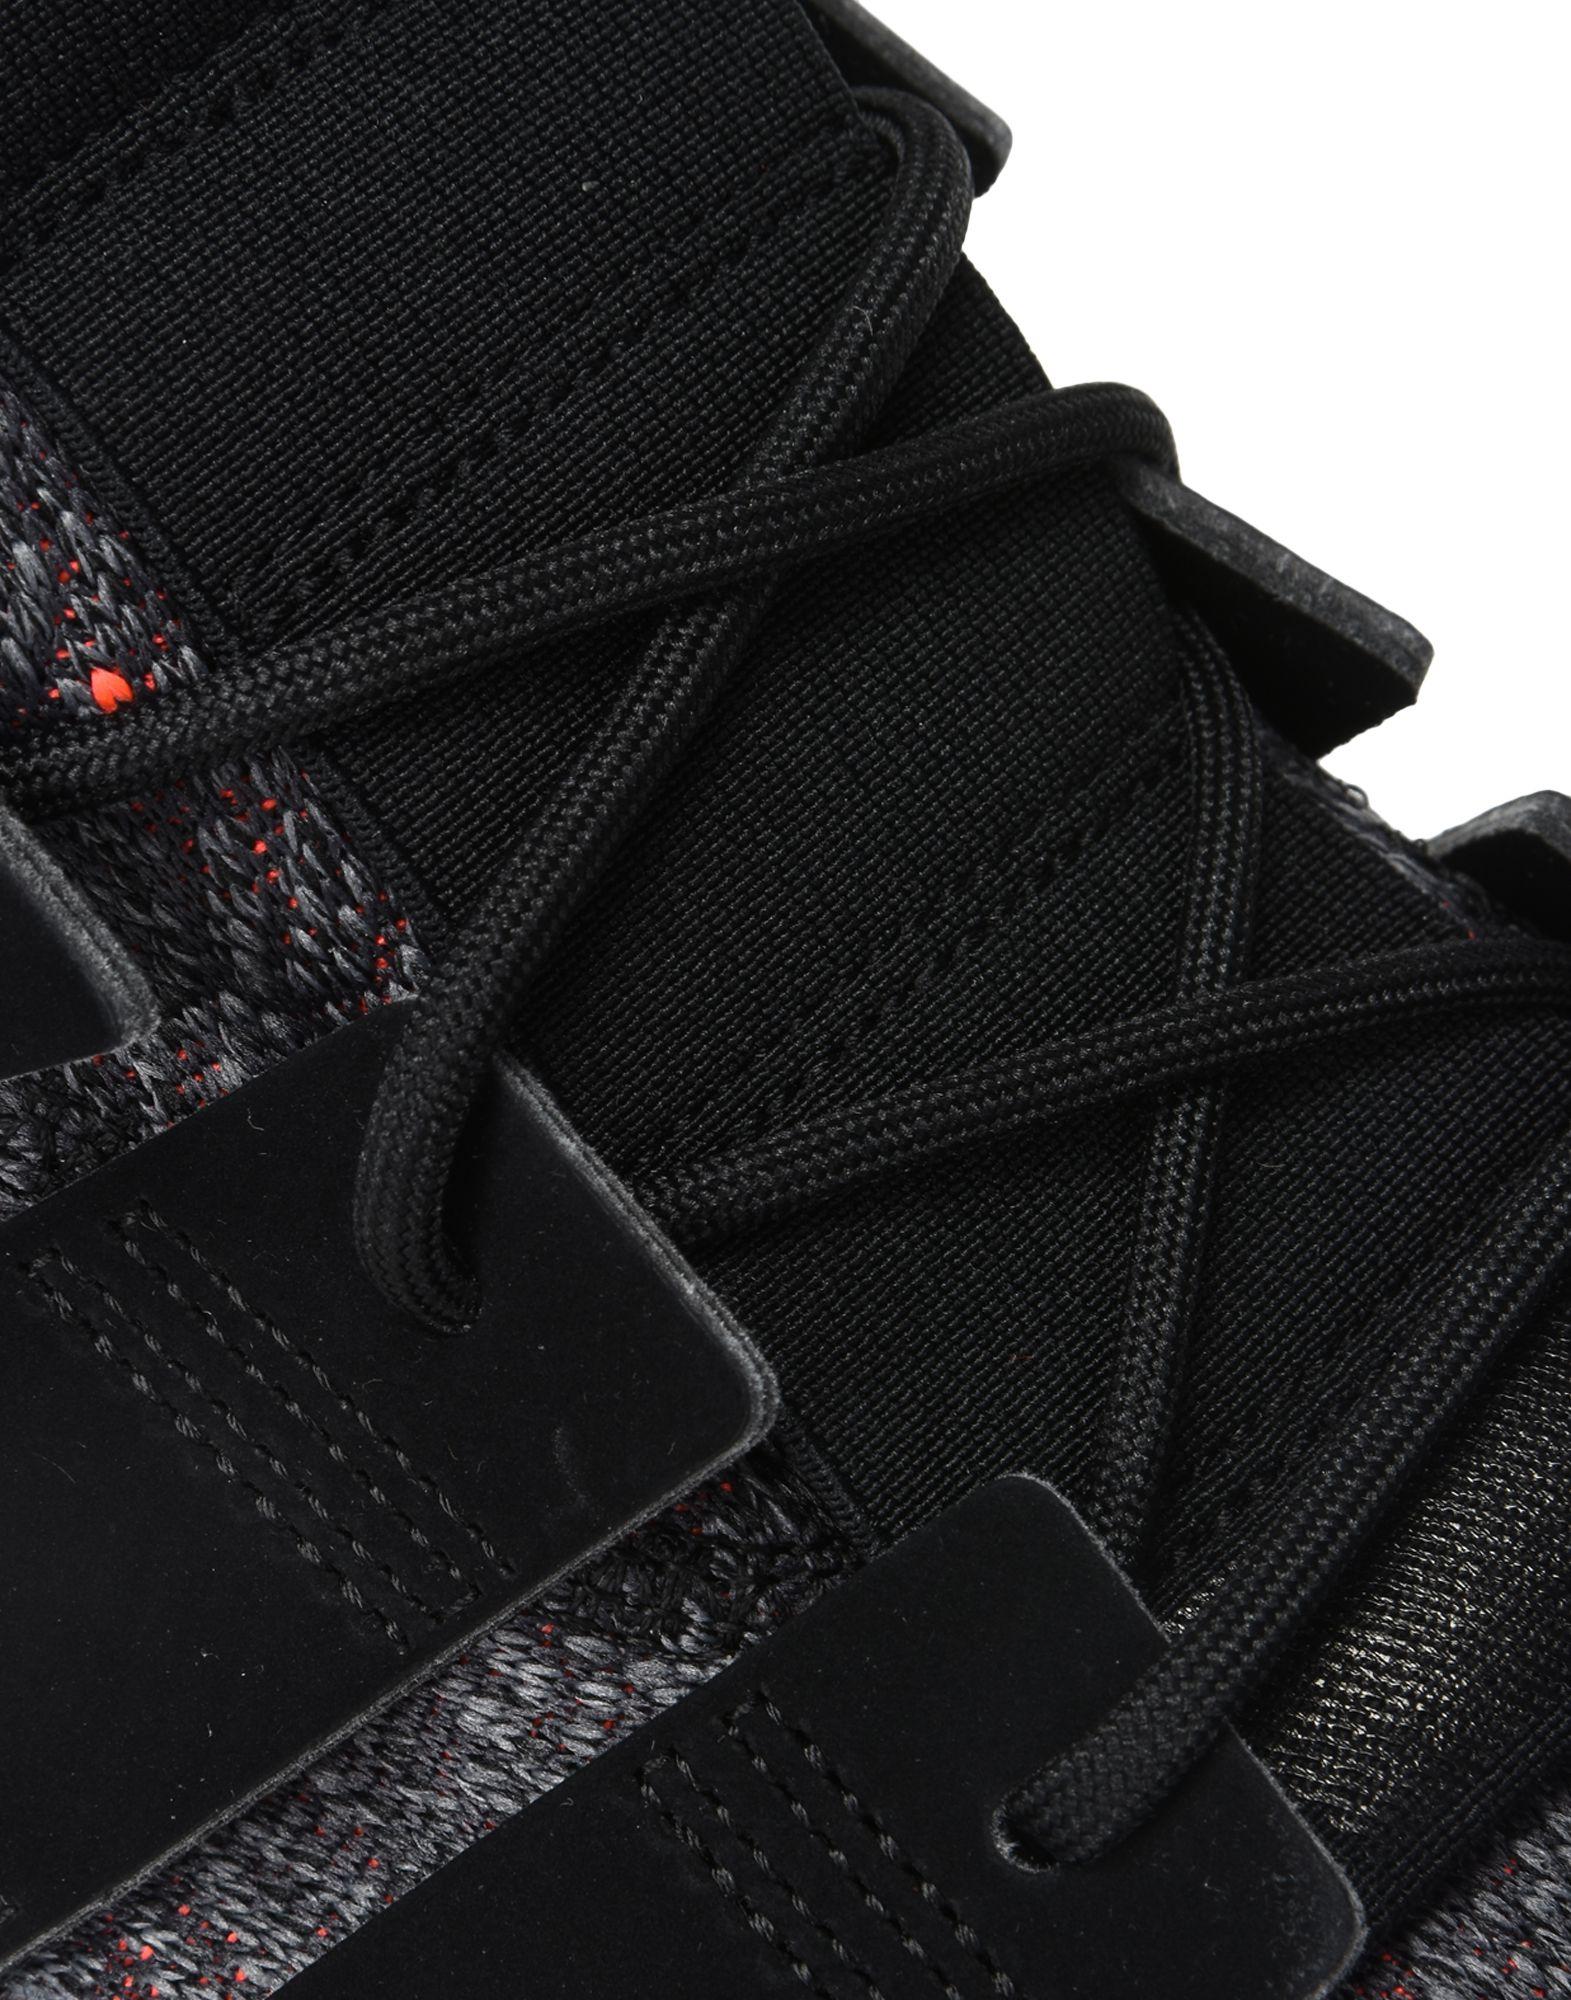 11414714AT Adidas Originals Prophere  11414714AT  Heiße Schuhe 74c78b